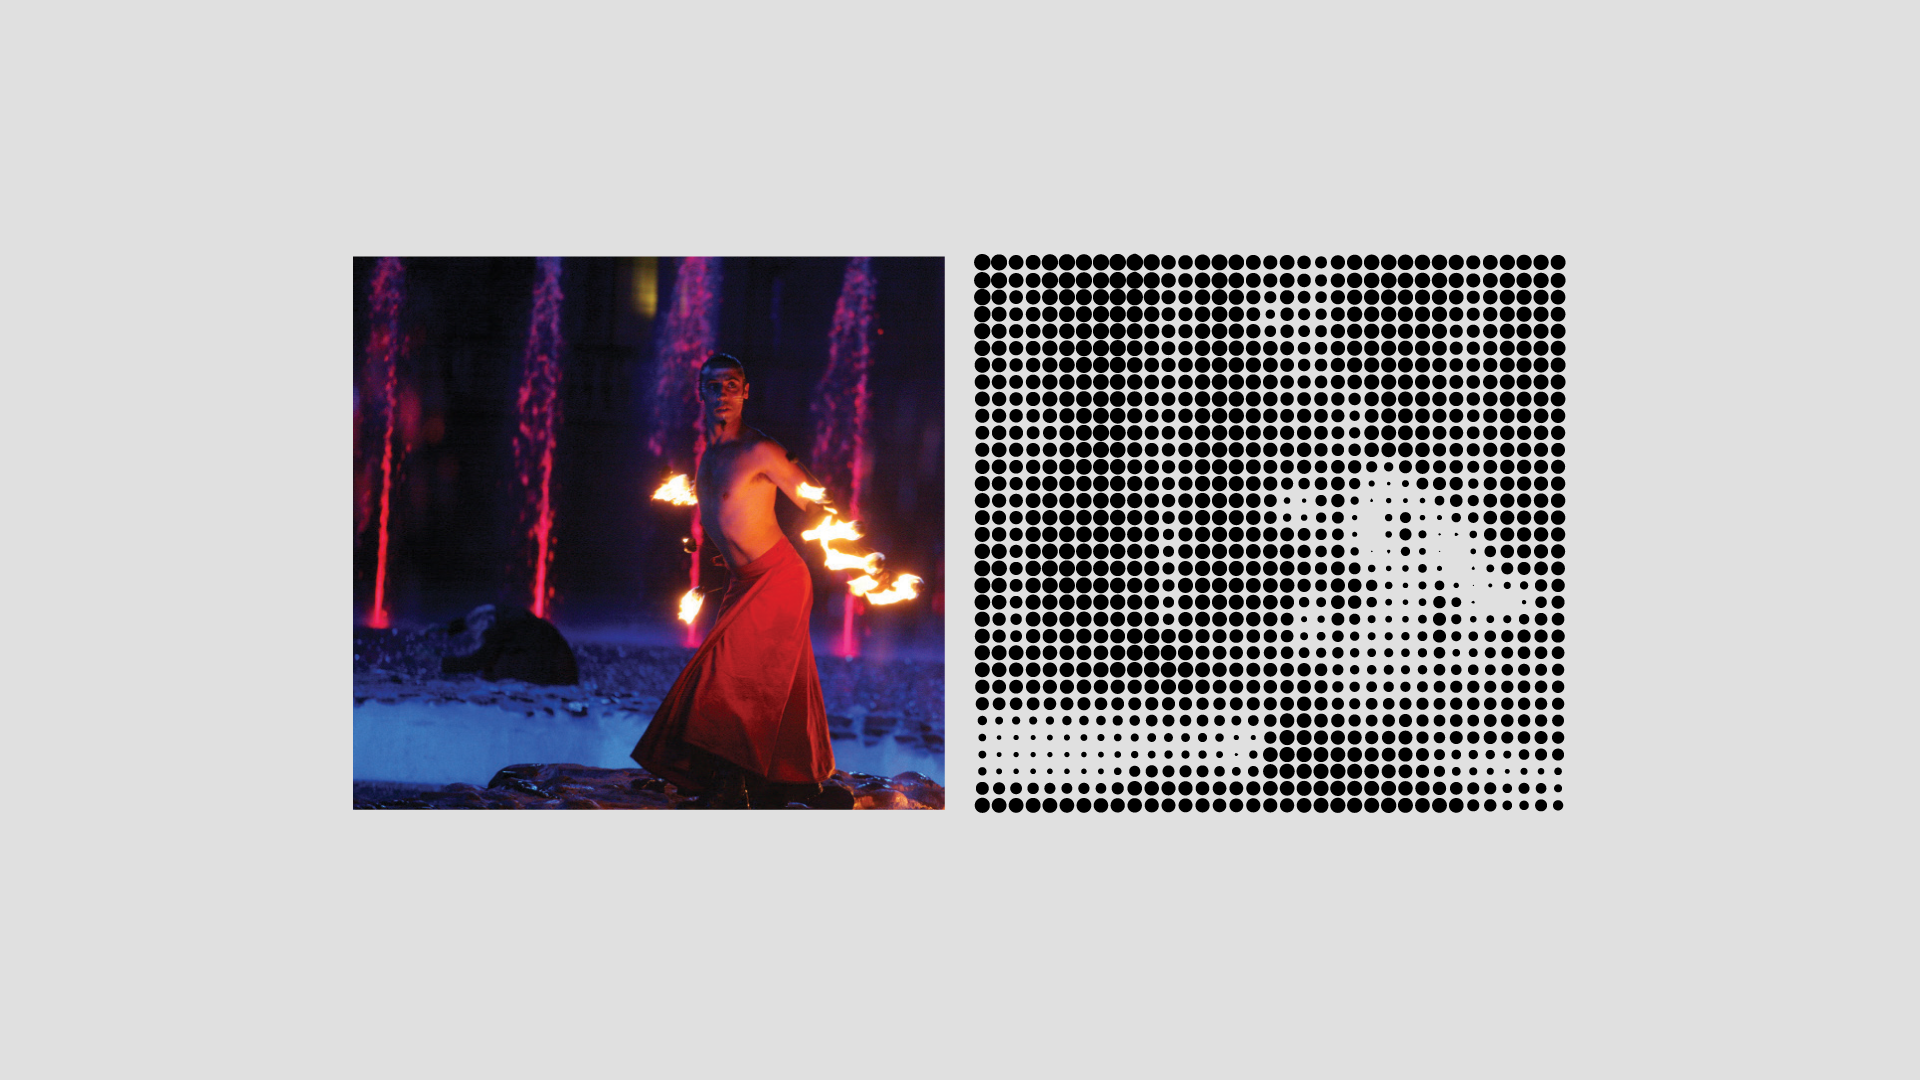 watercube retracing image